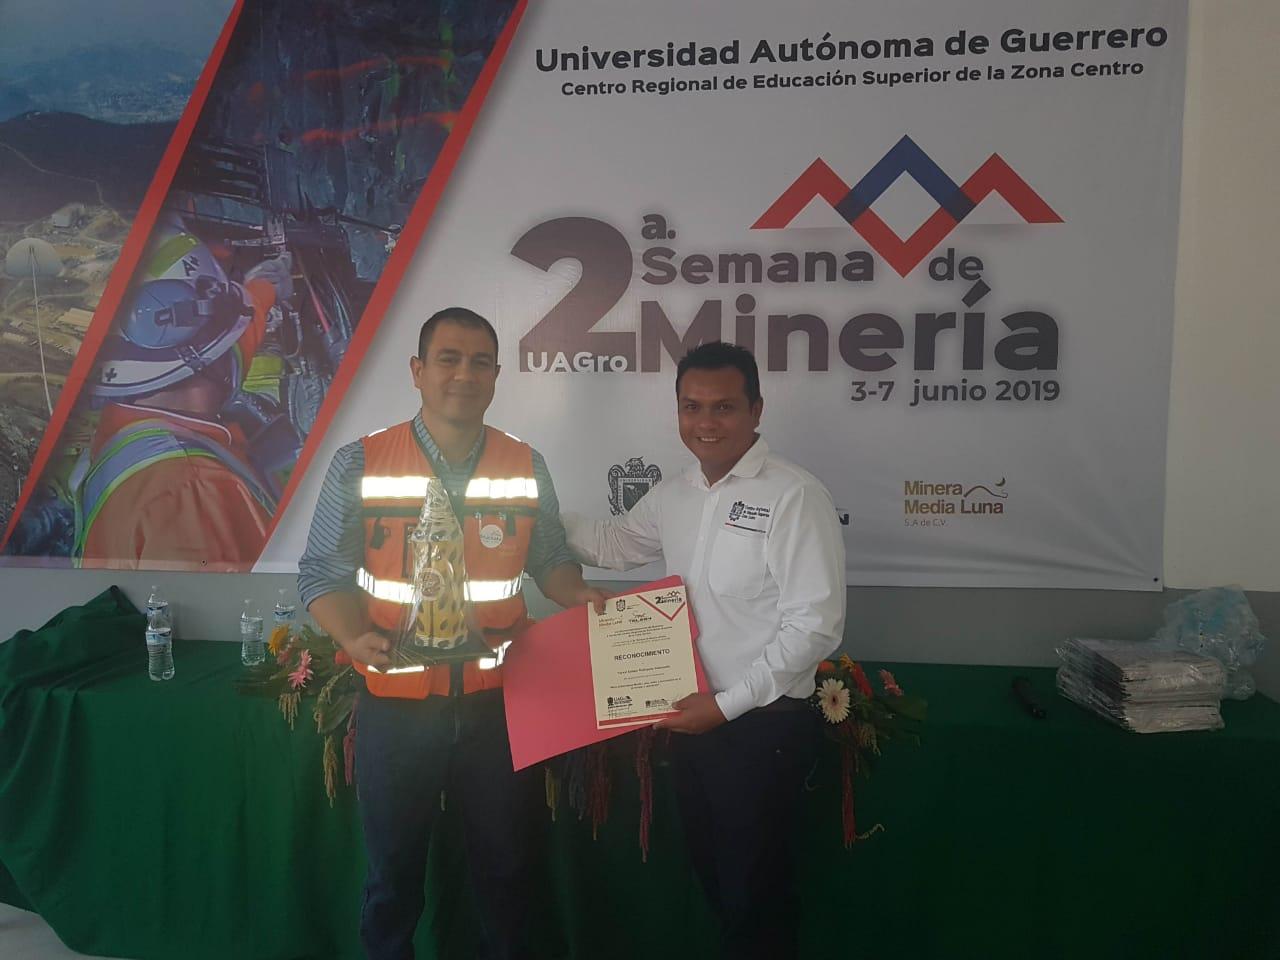 Reafirma Minera Media Luna compromiso con universitarios